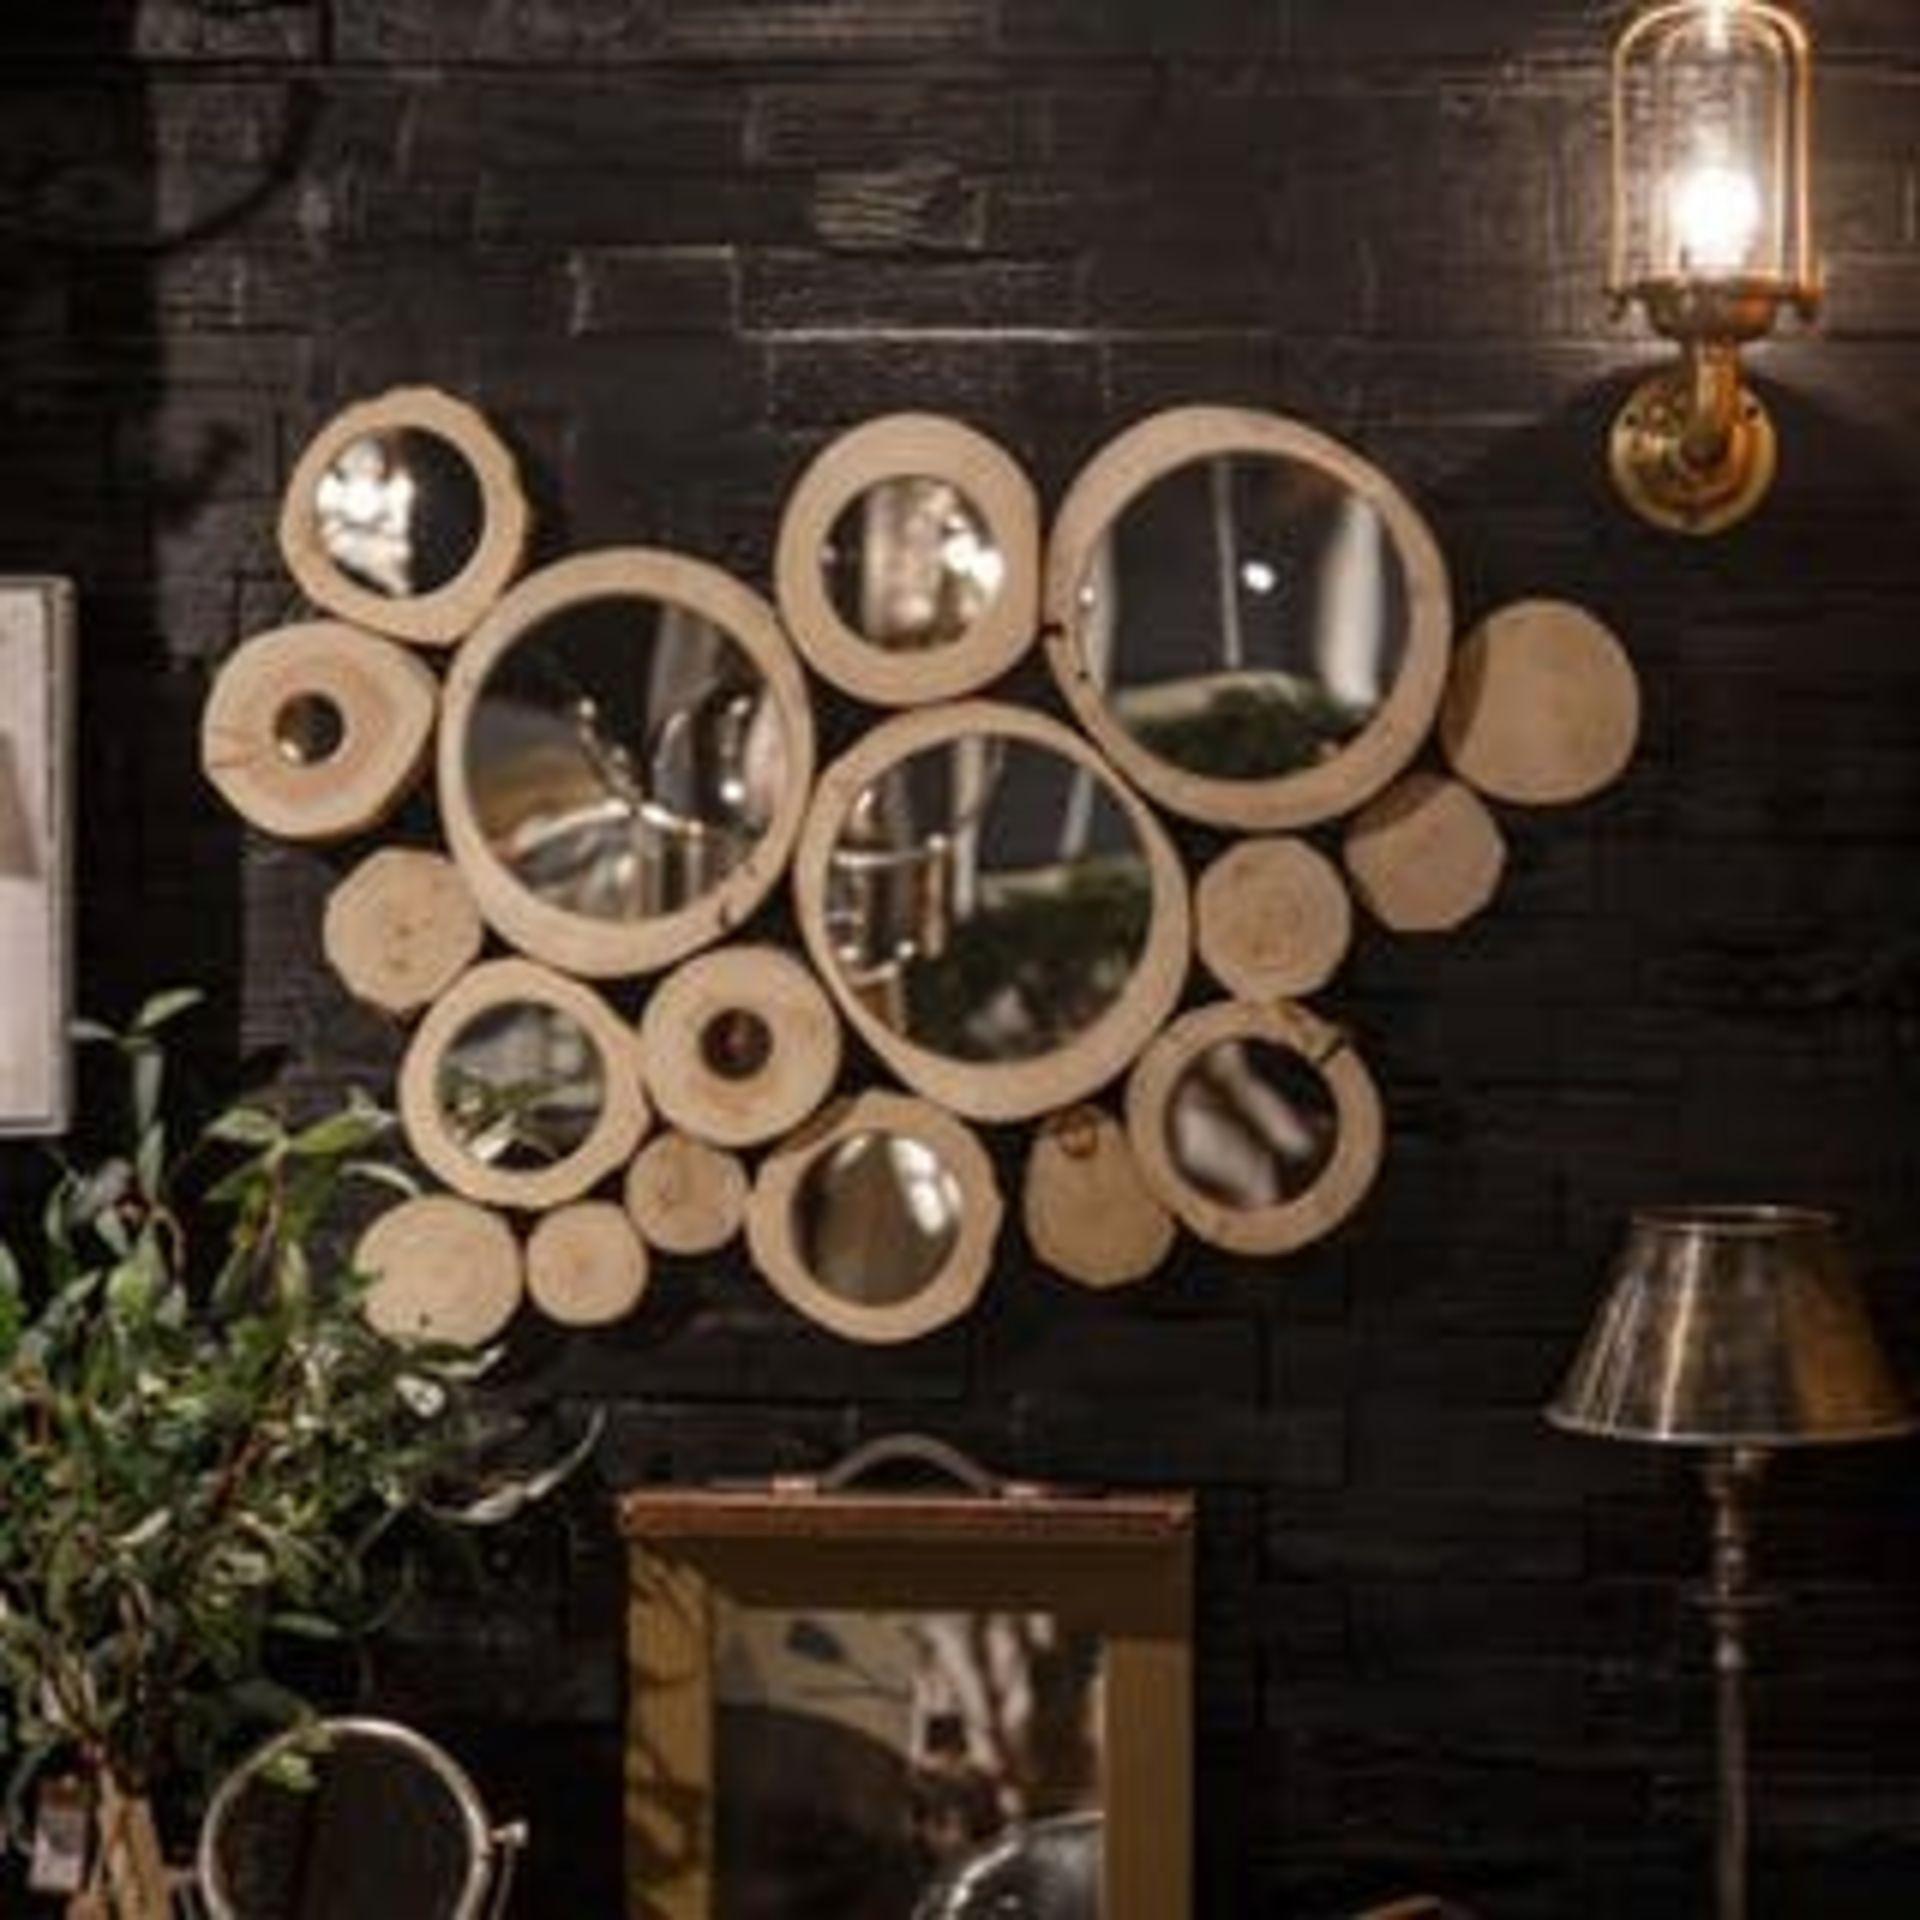 Lot 33 - Bleu Nature M214 Cirkel Mirror Finished In: Natural Oak Dimensions: 43 X 6 X 35cm RRP £530